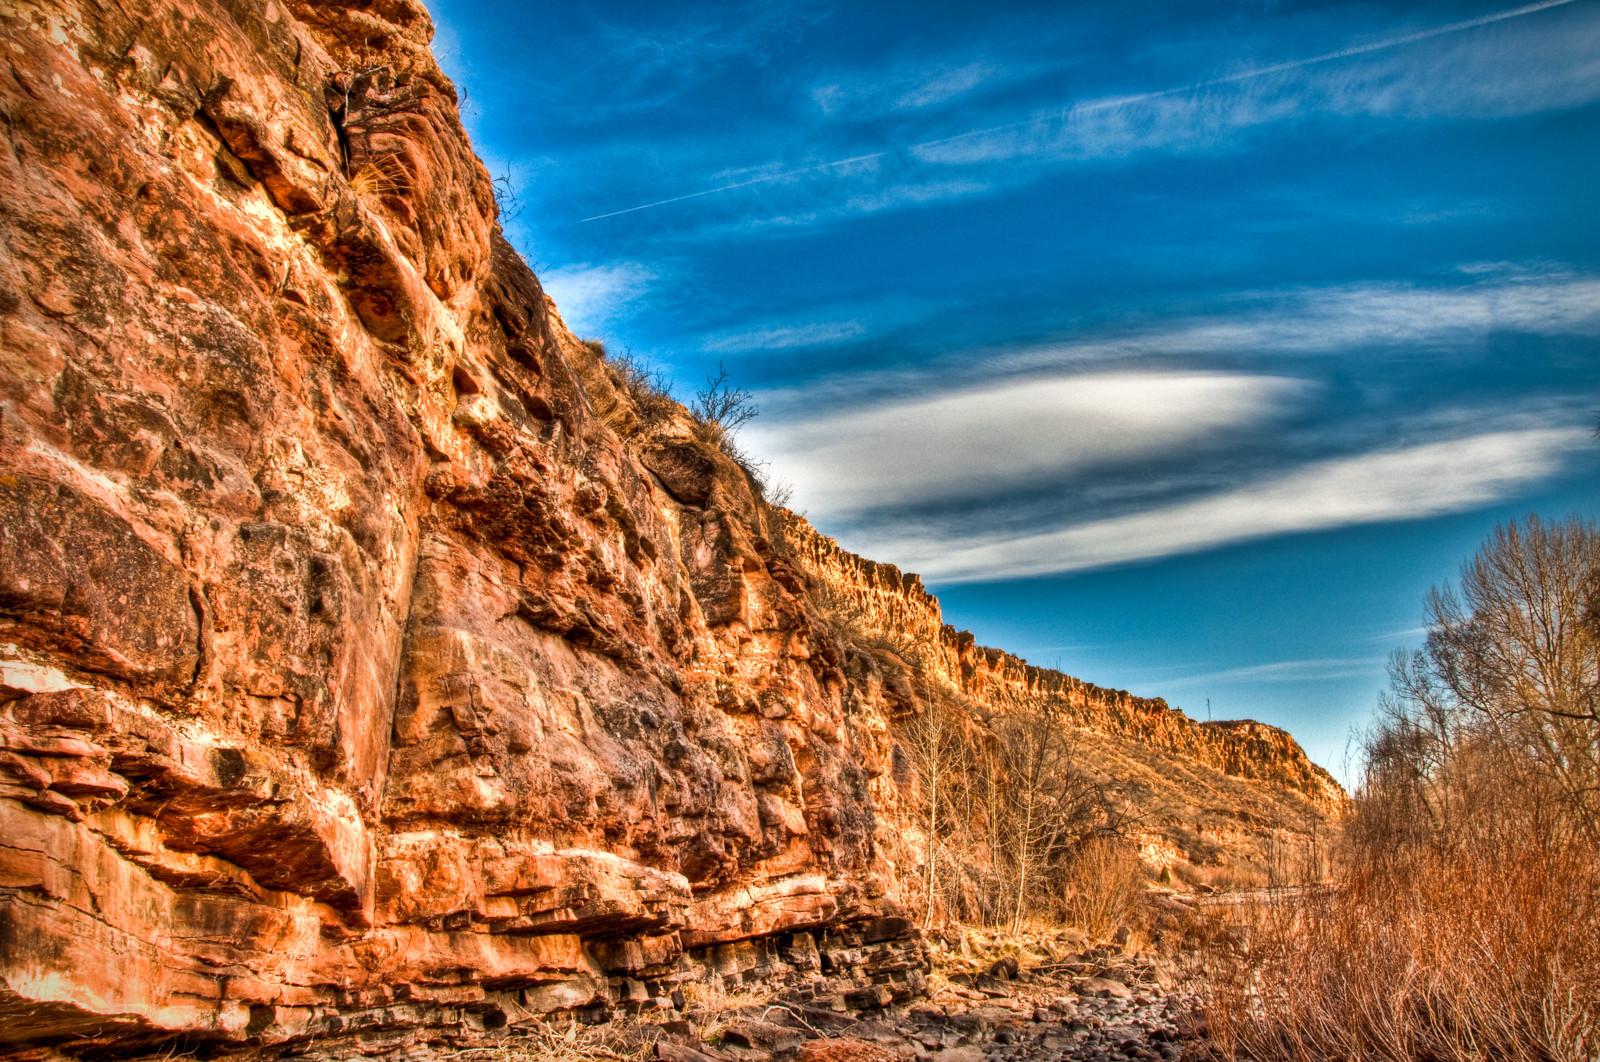 Image of the rock walls at Watson Lake SWA in Bellvue, Colorado